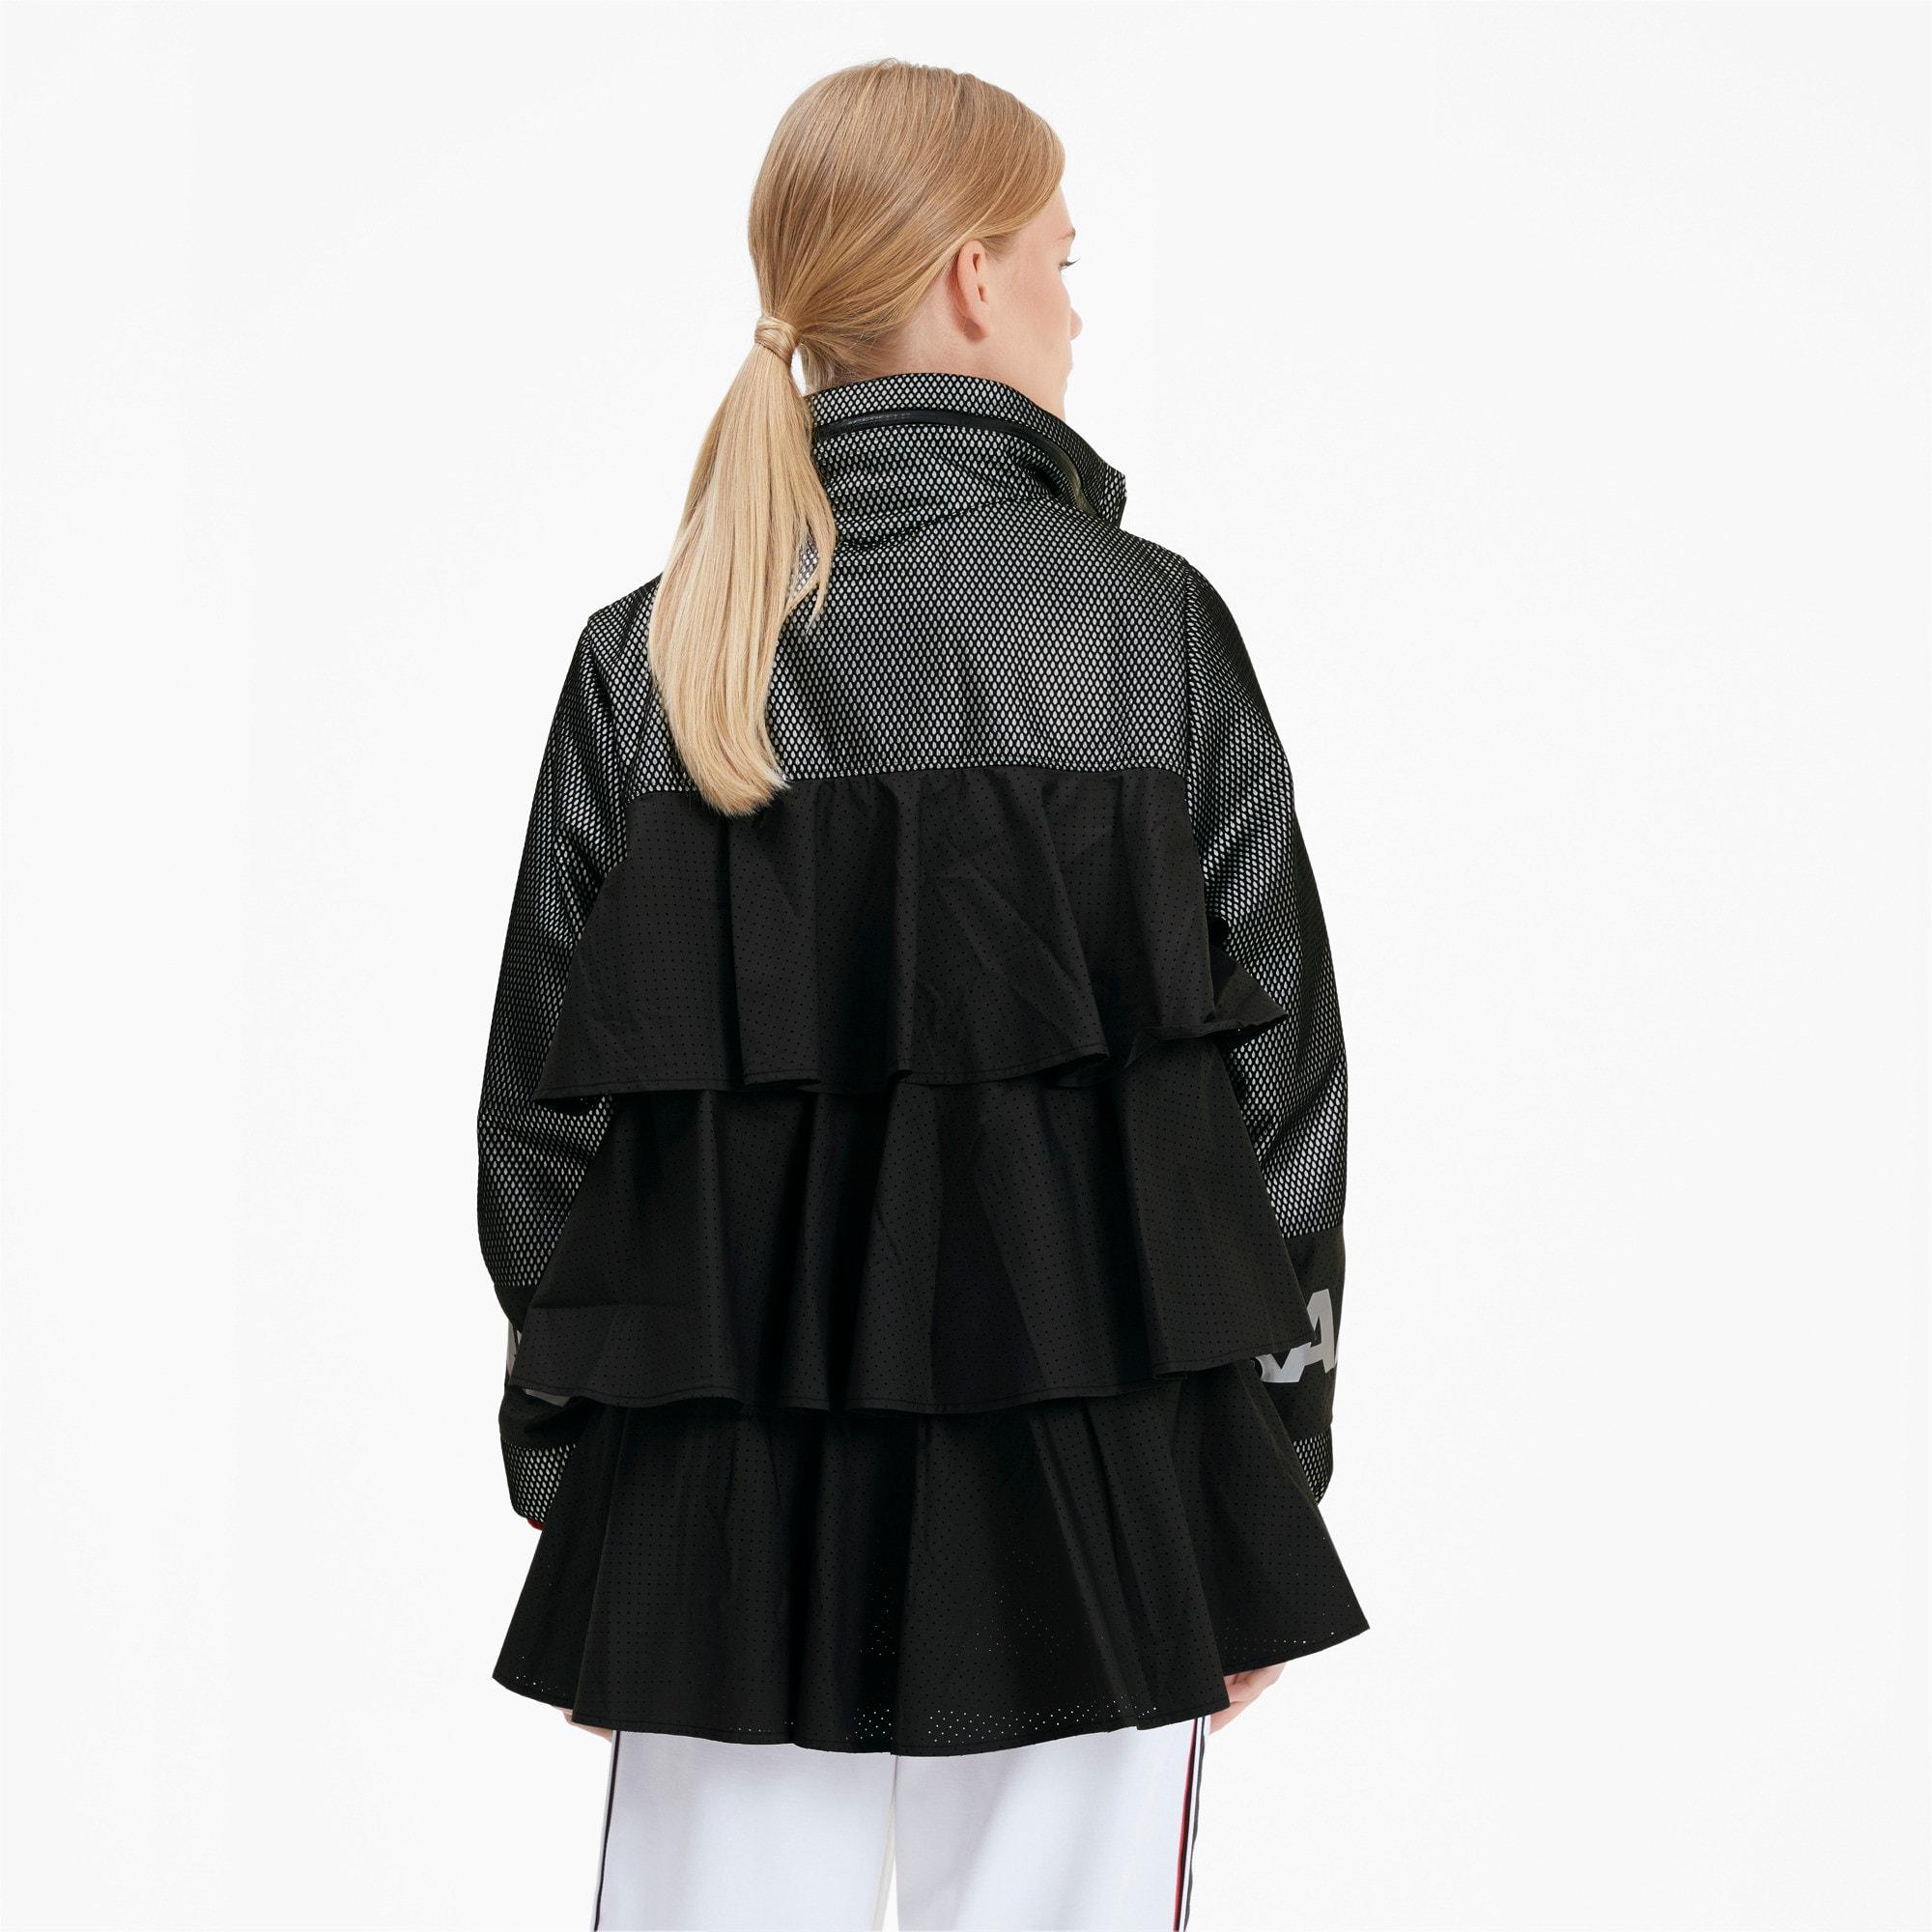 Thumbnail 2 of PUMA x KARL LAGERFELD Women's Outerwear Jacket, Puma Black, medium